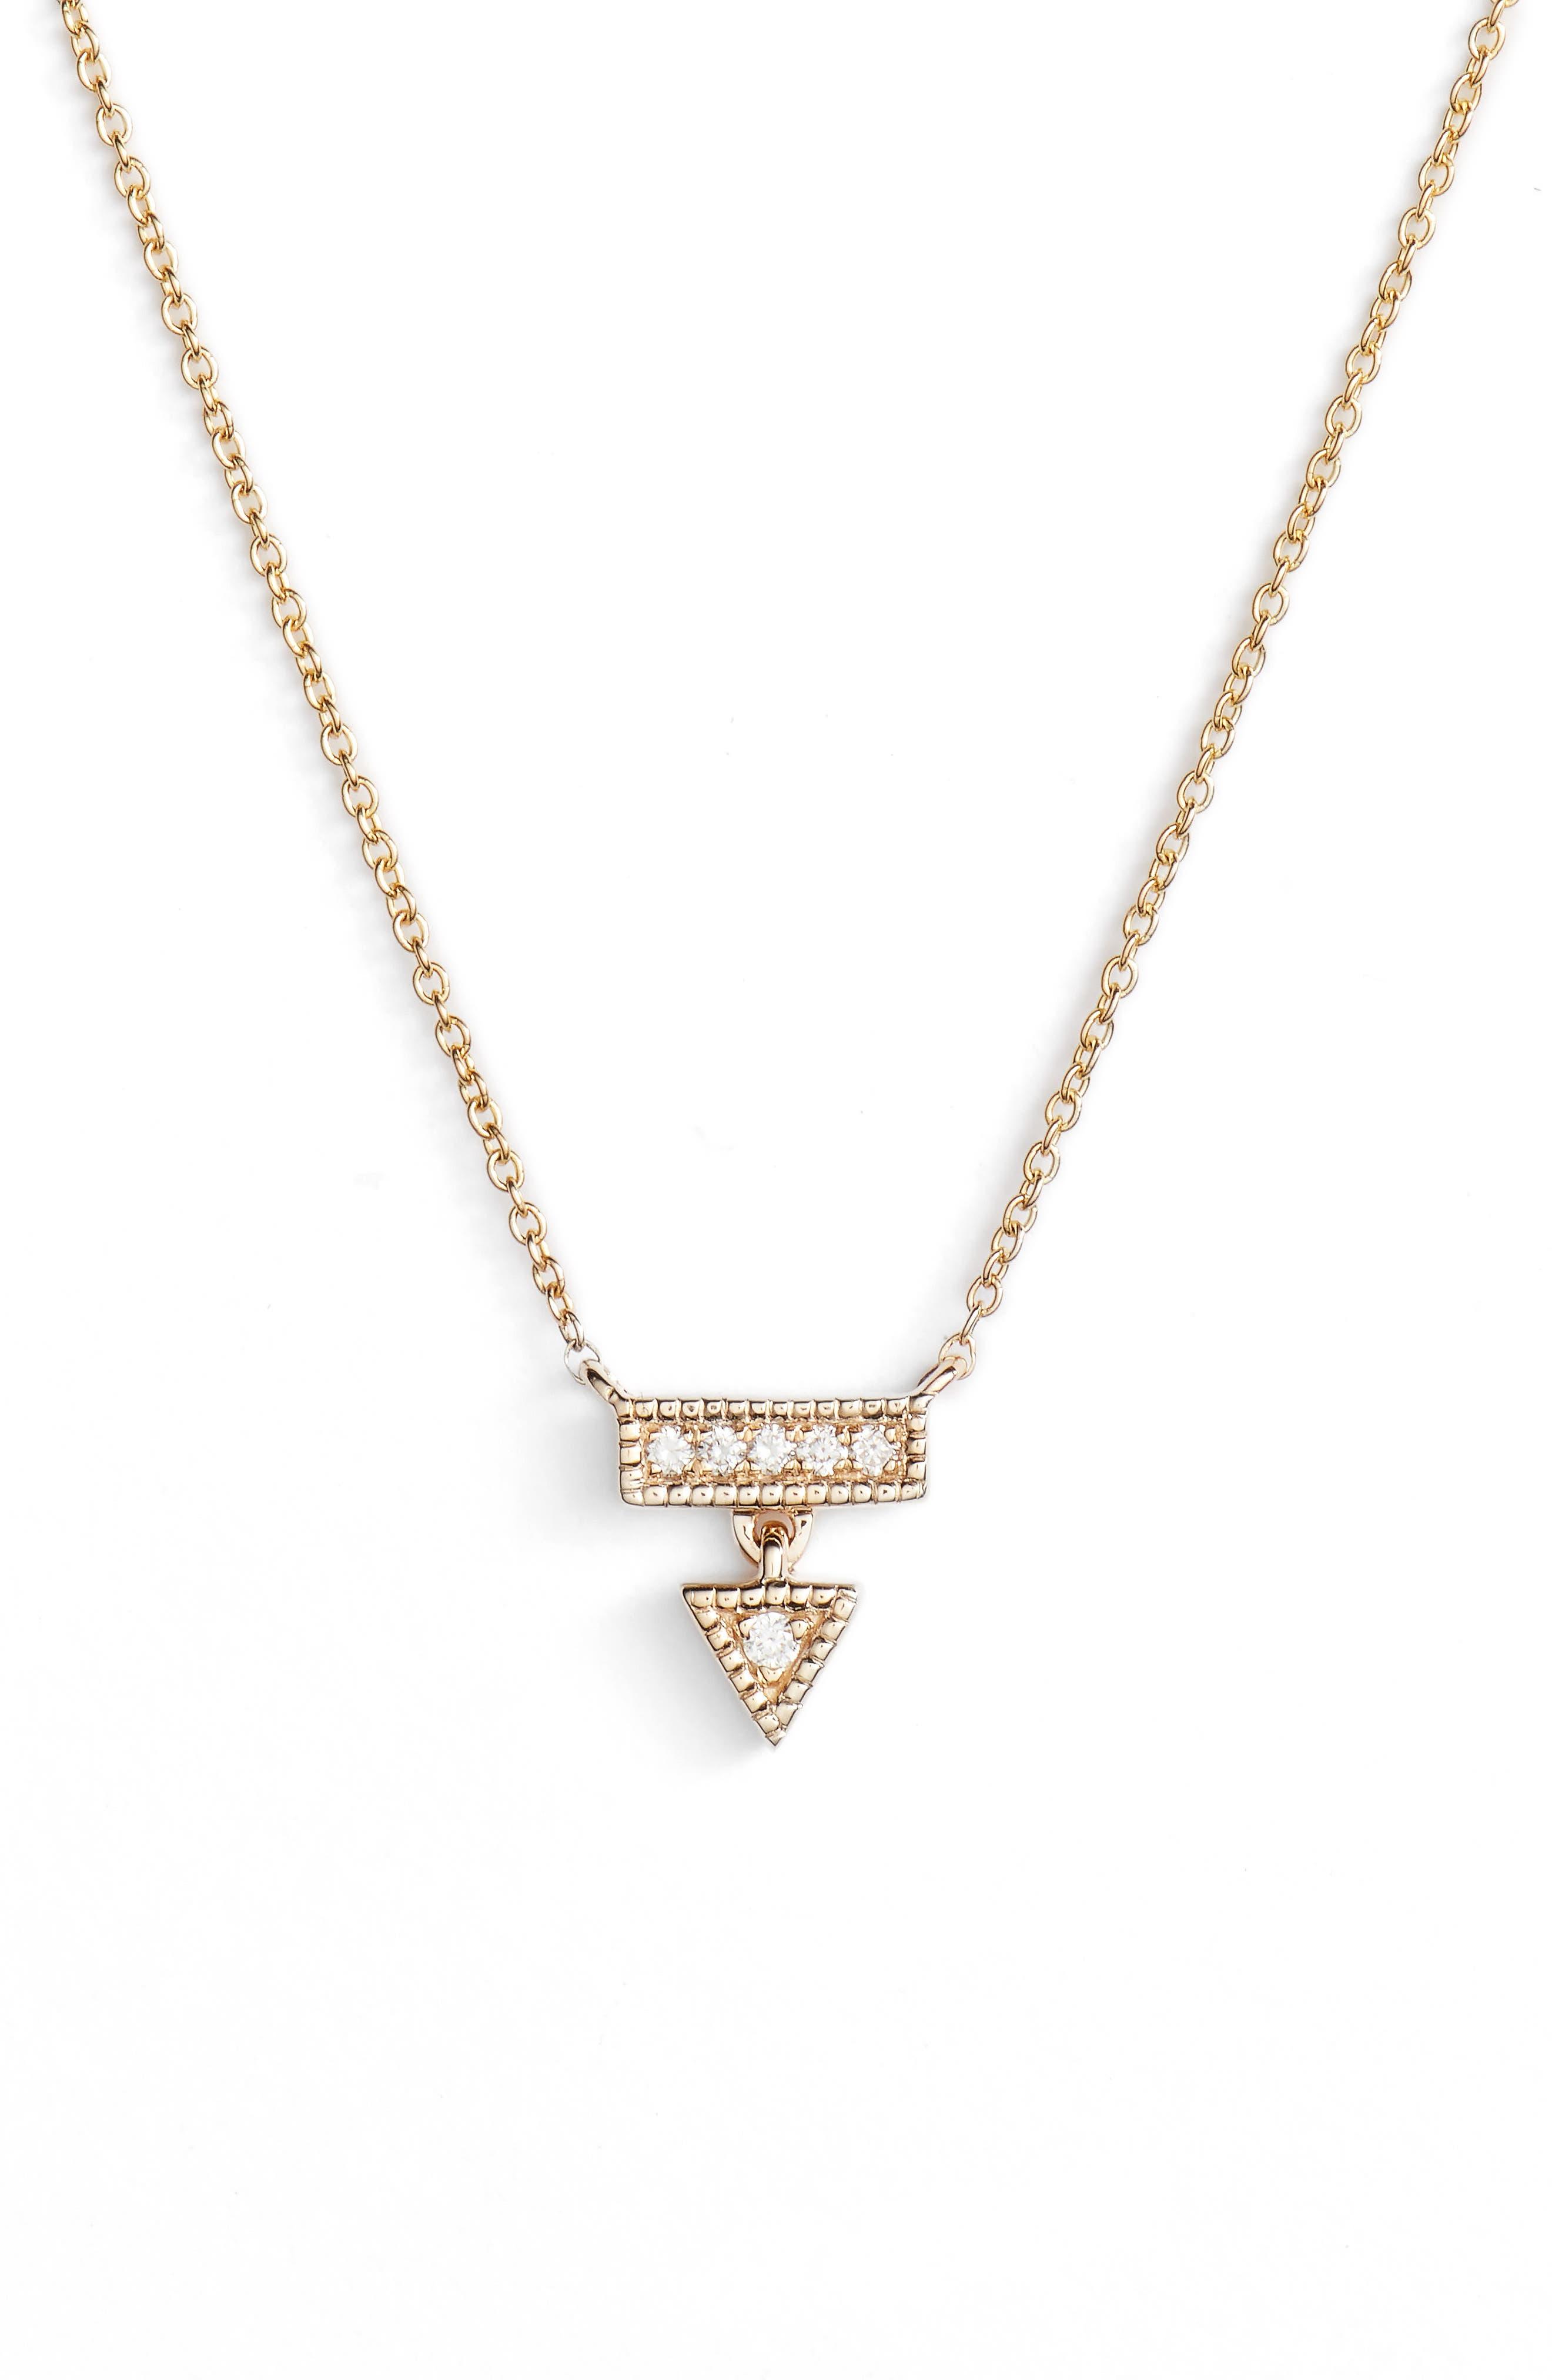 Dana Rebecca Designs Emily Sarah Diamond Triangle Dangle Necklace